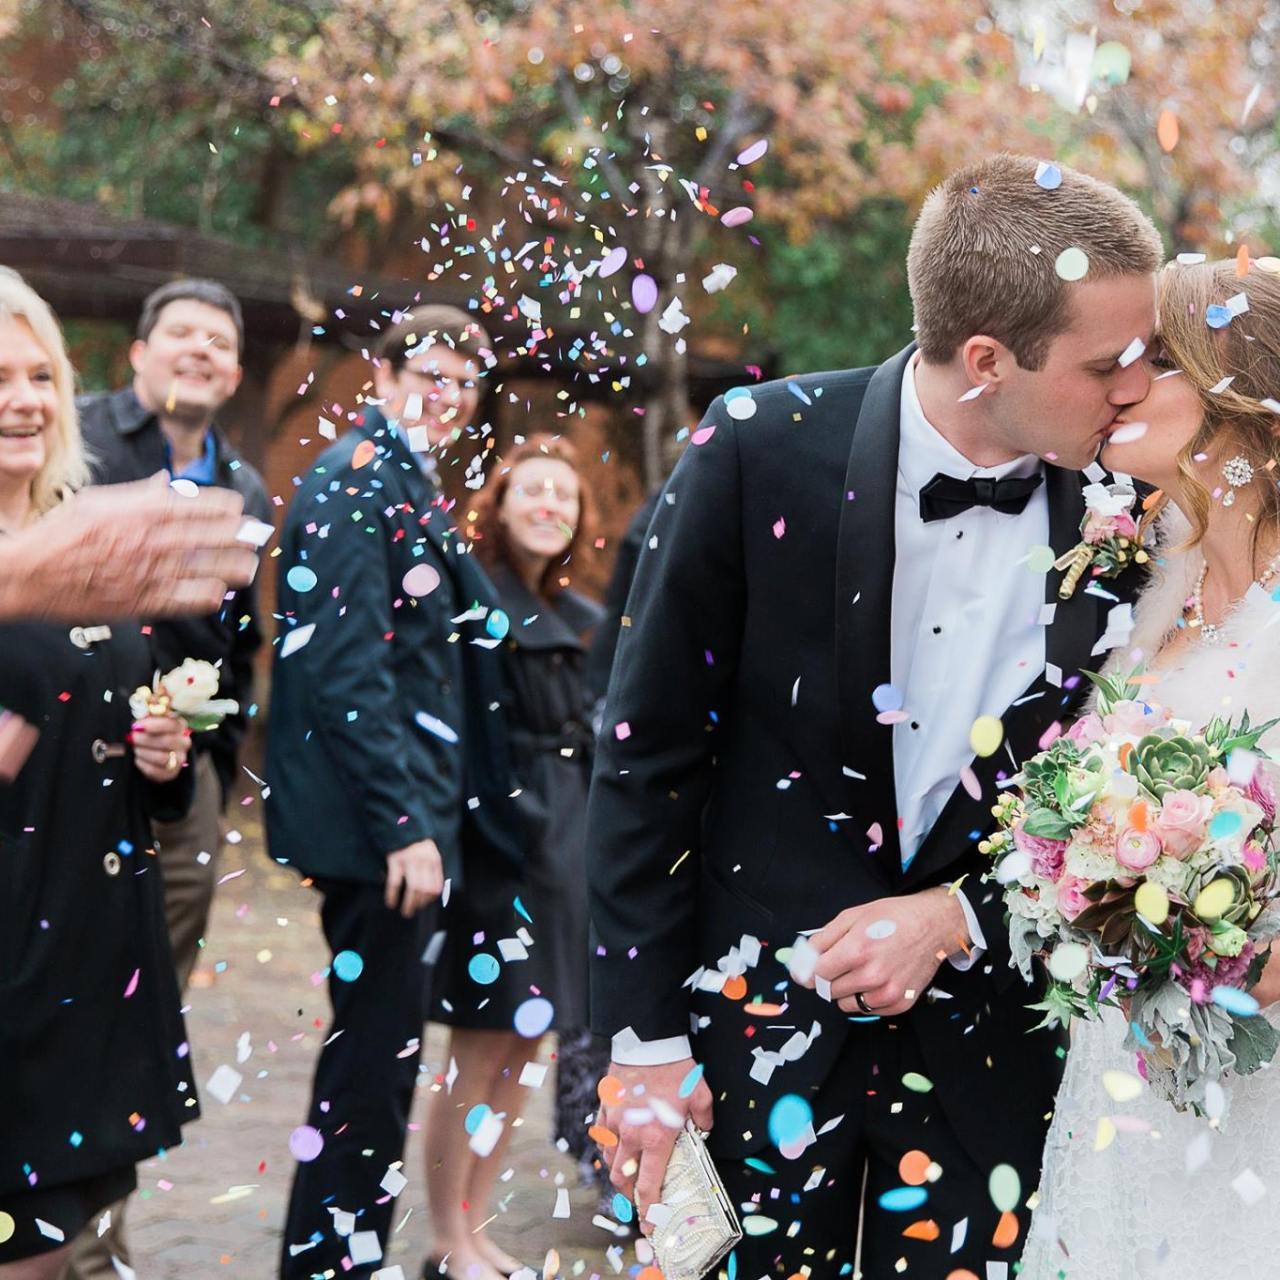 Our Brunch Wedding Reception